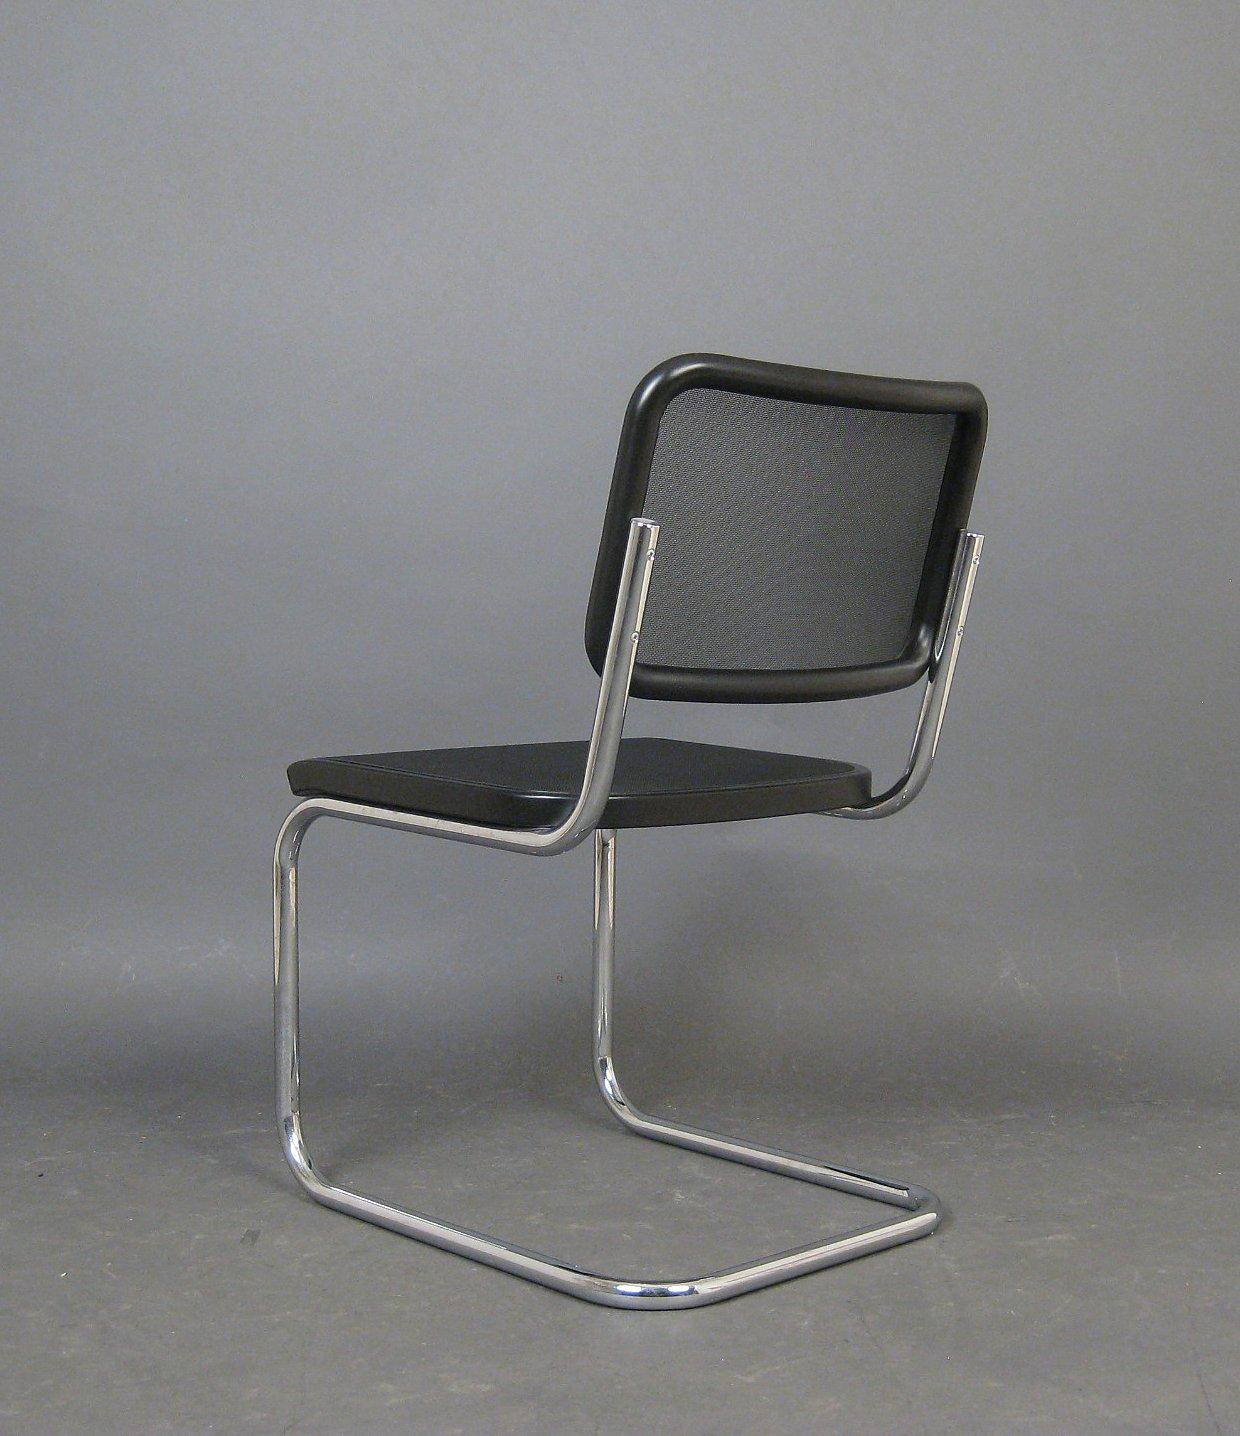 Marcel Breuer, tubular steel cantilever chair model S 32 N in network of Thonet